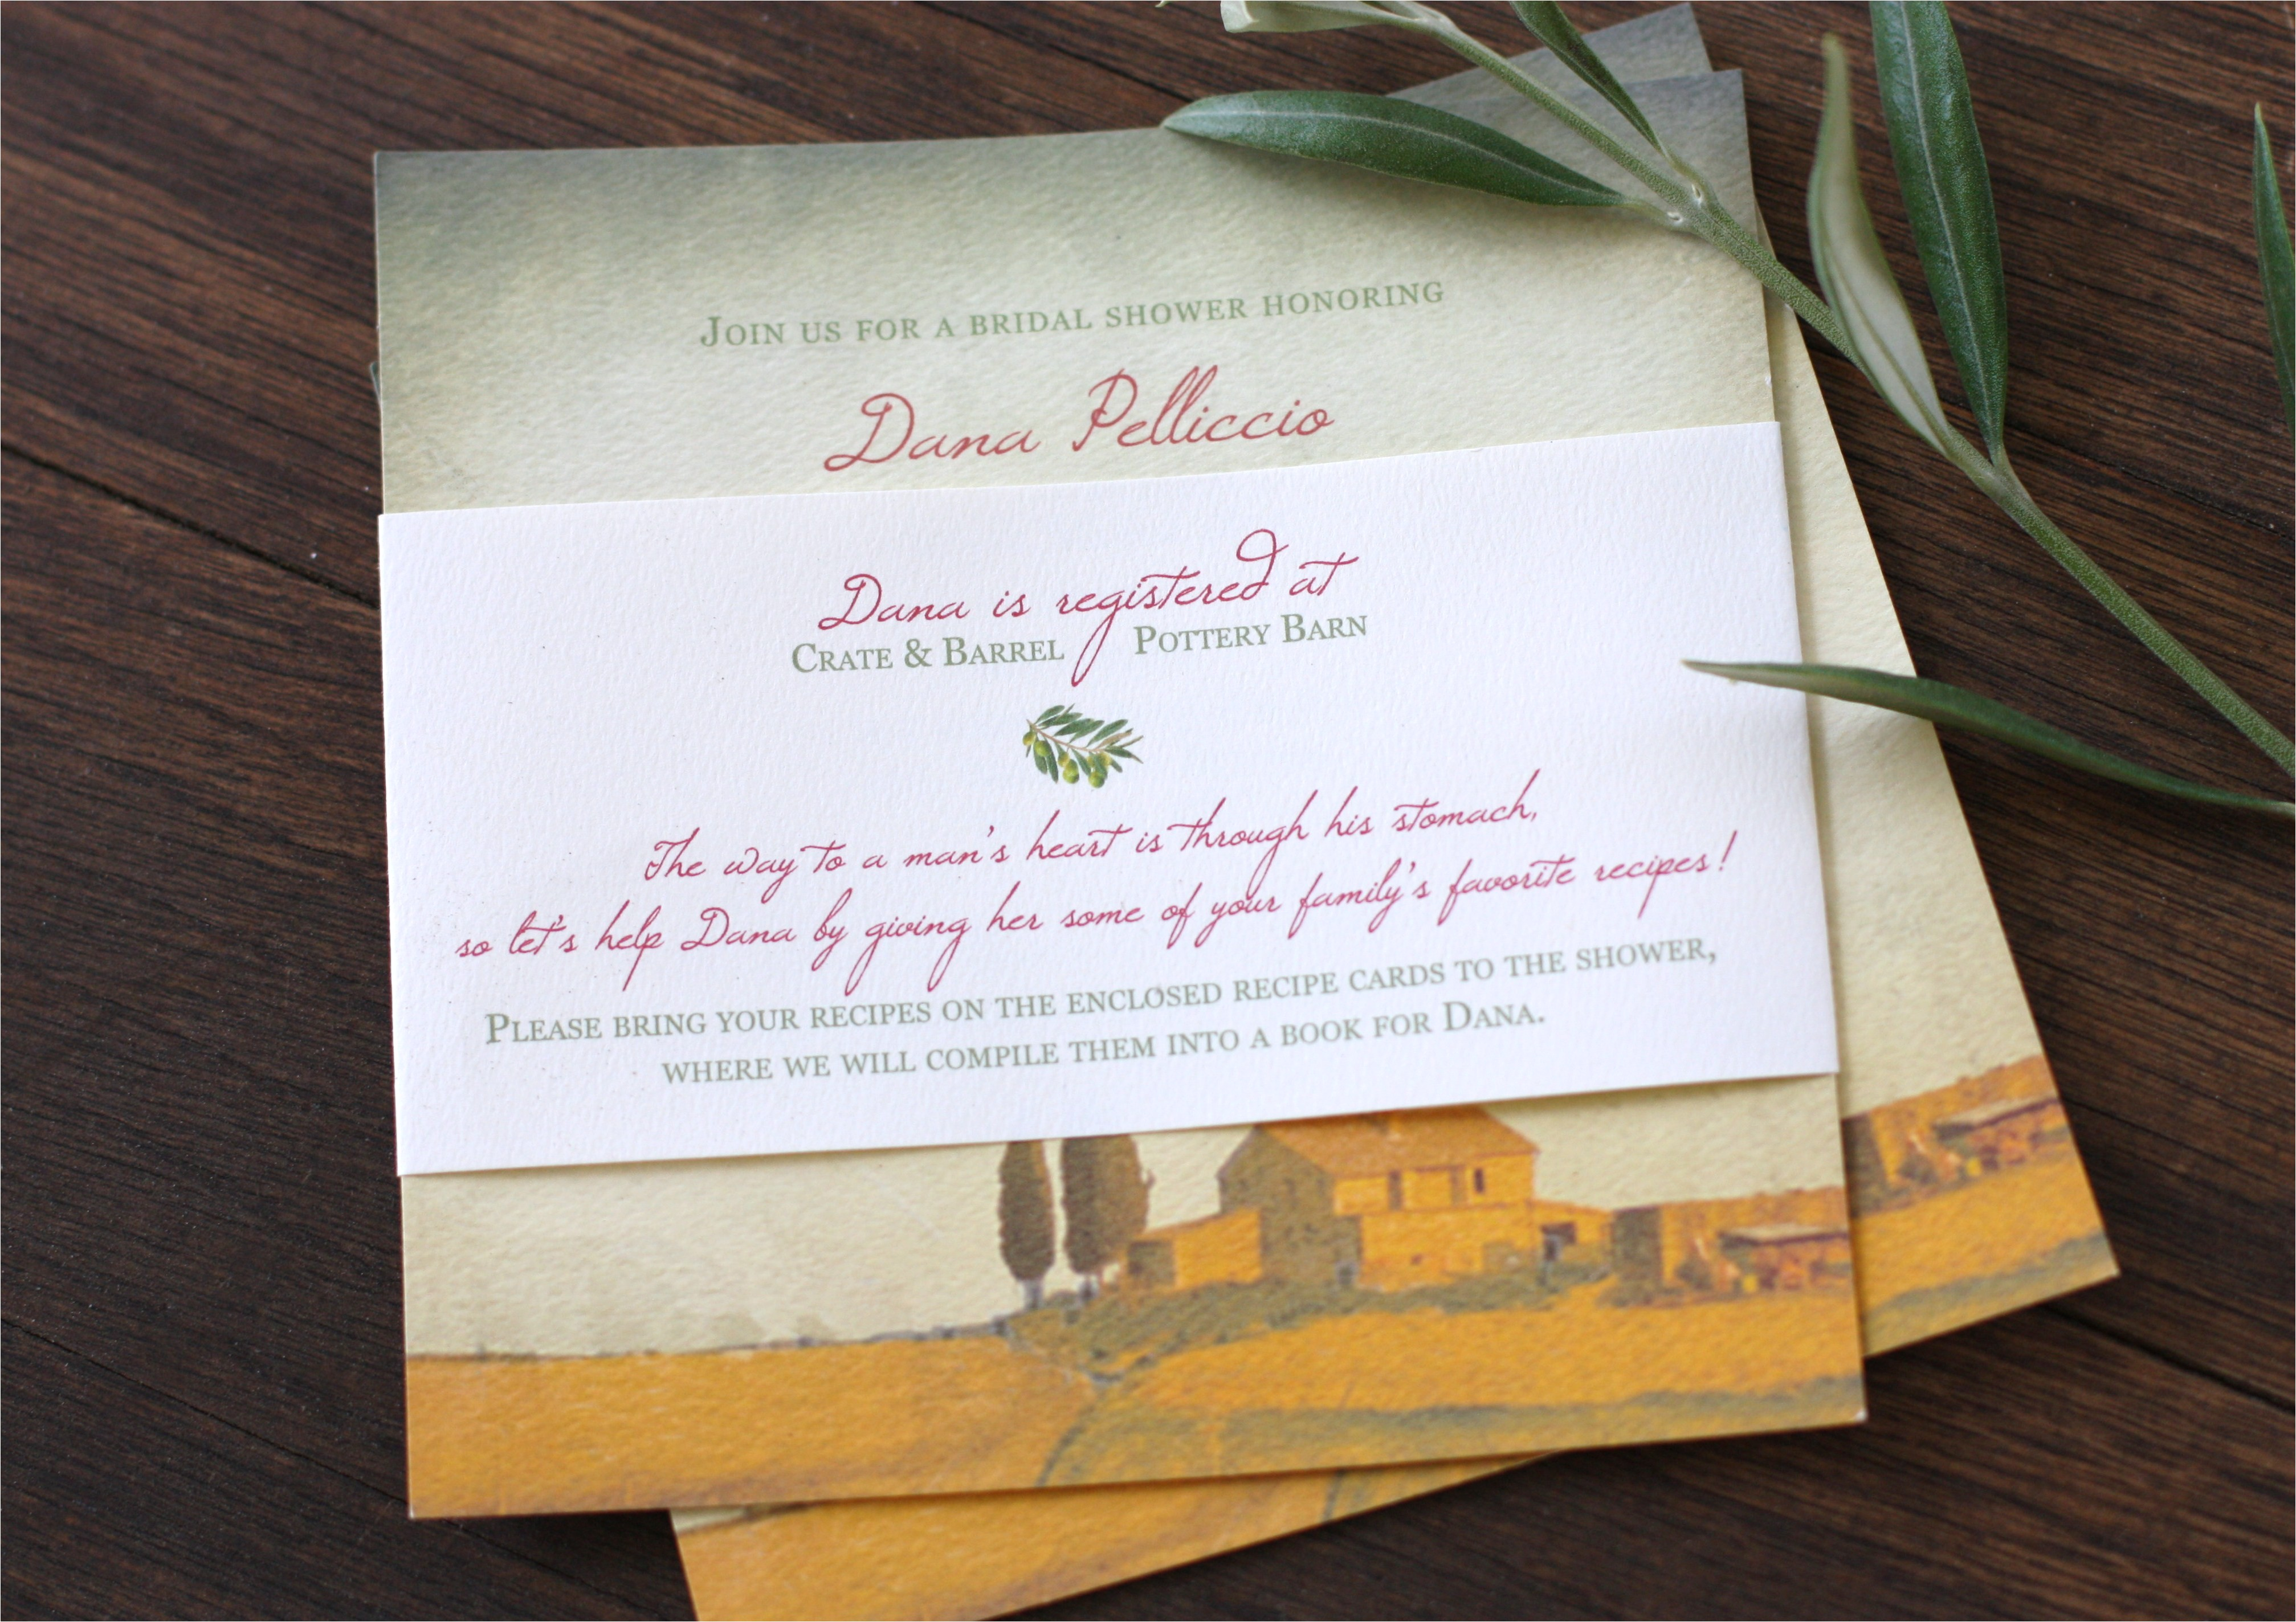 Tuscan Bridal Shower Invitations Tuscan Bridal Shower Blush Floral Design